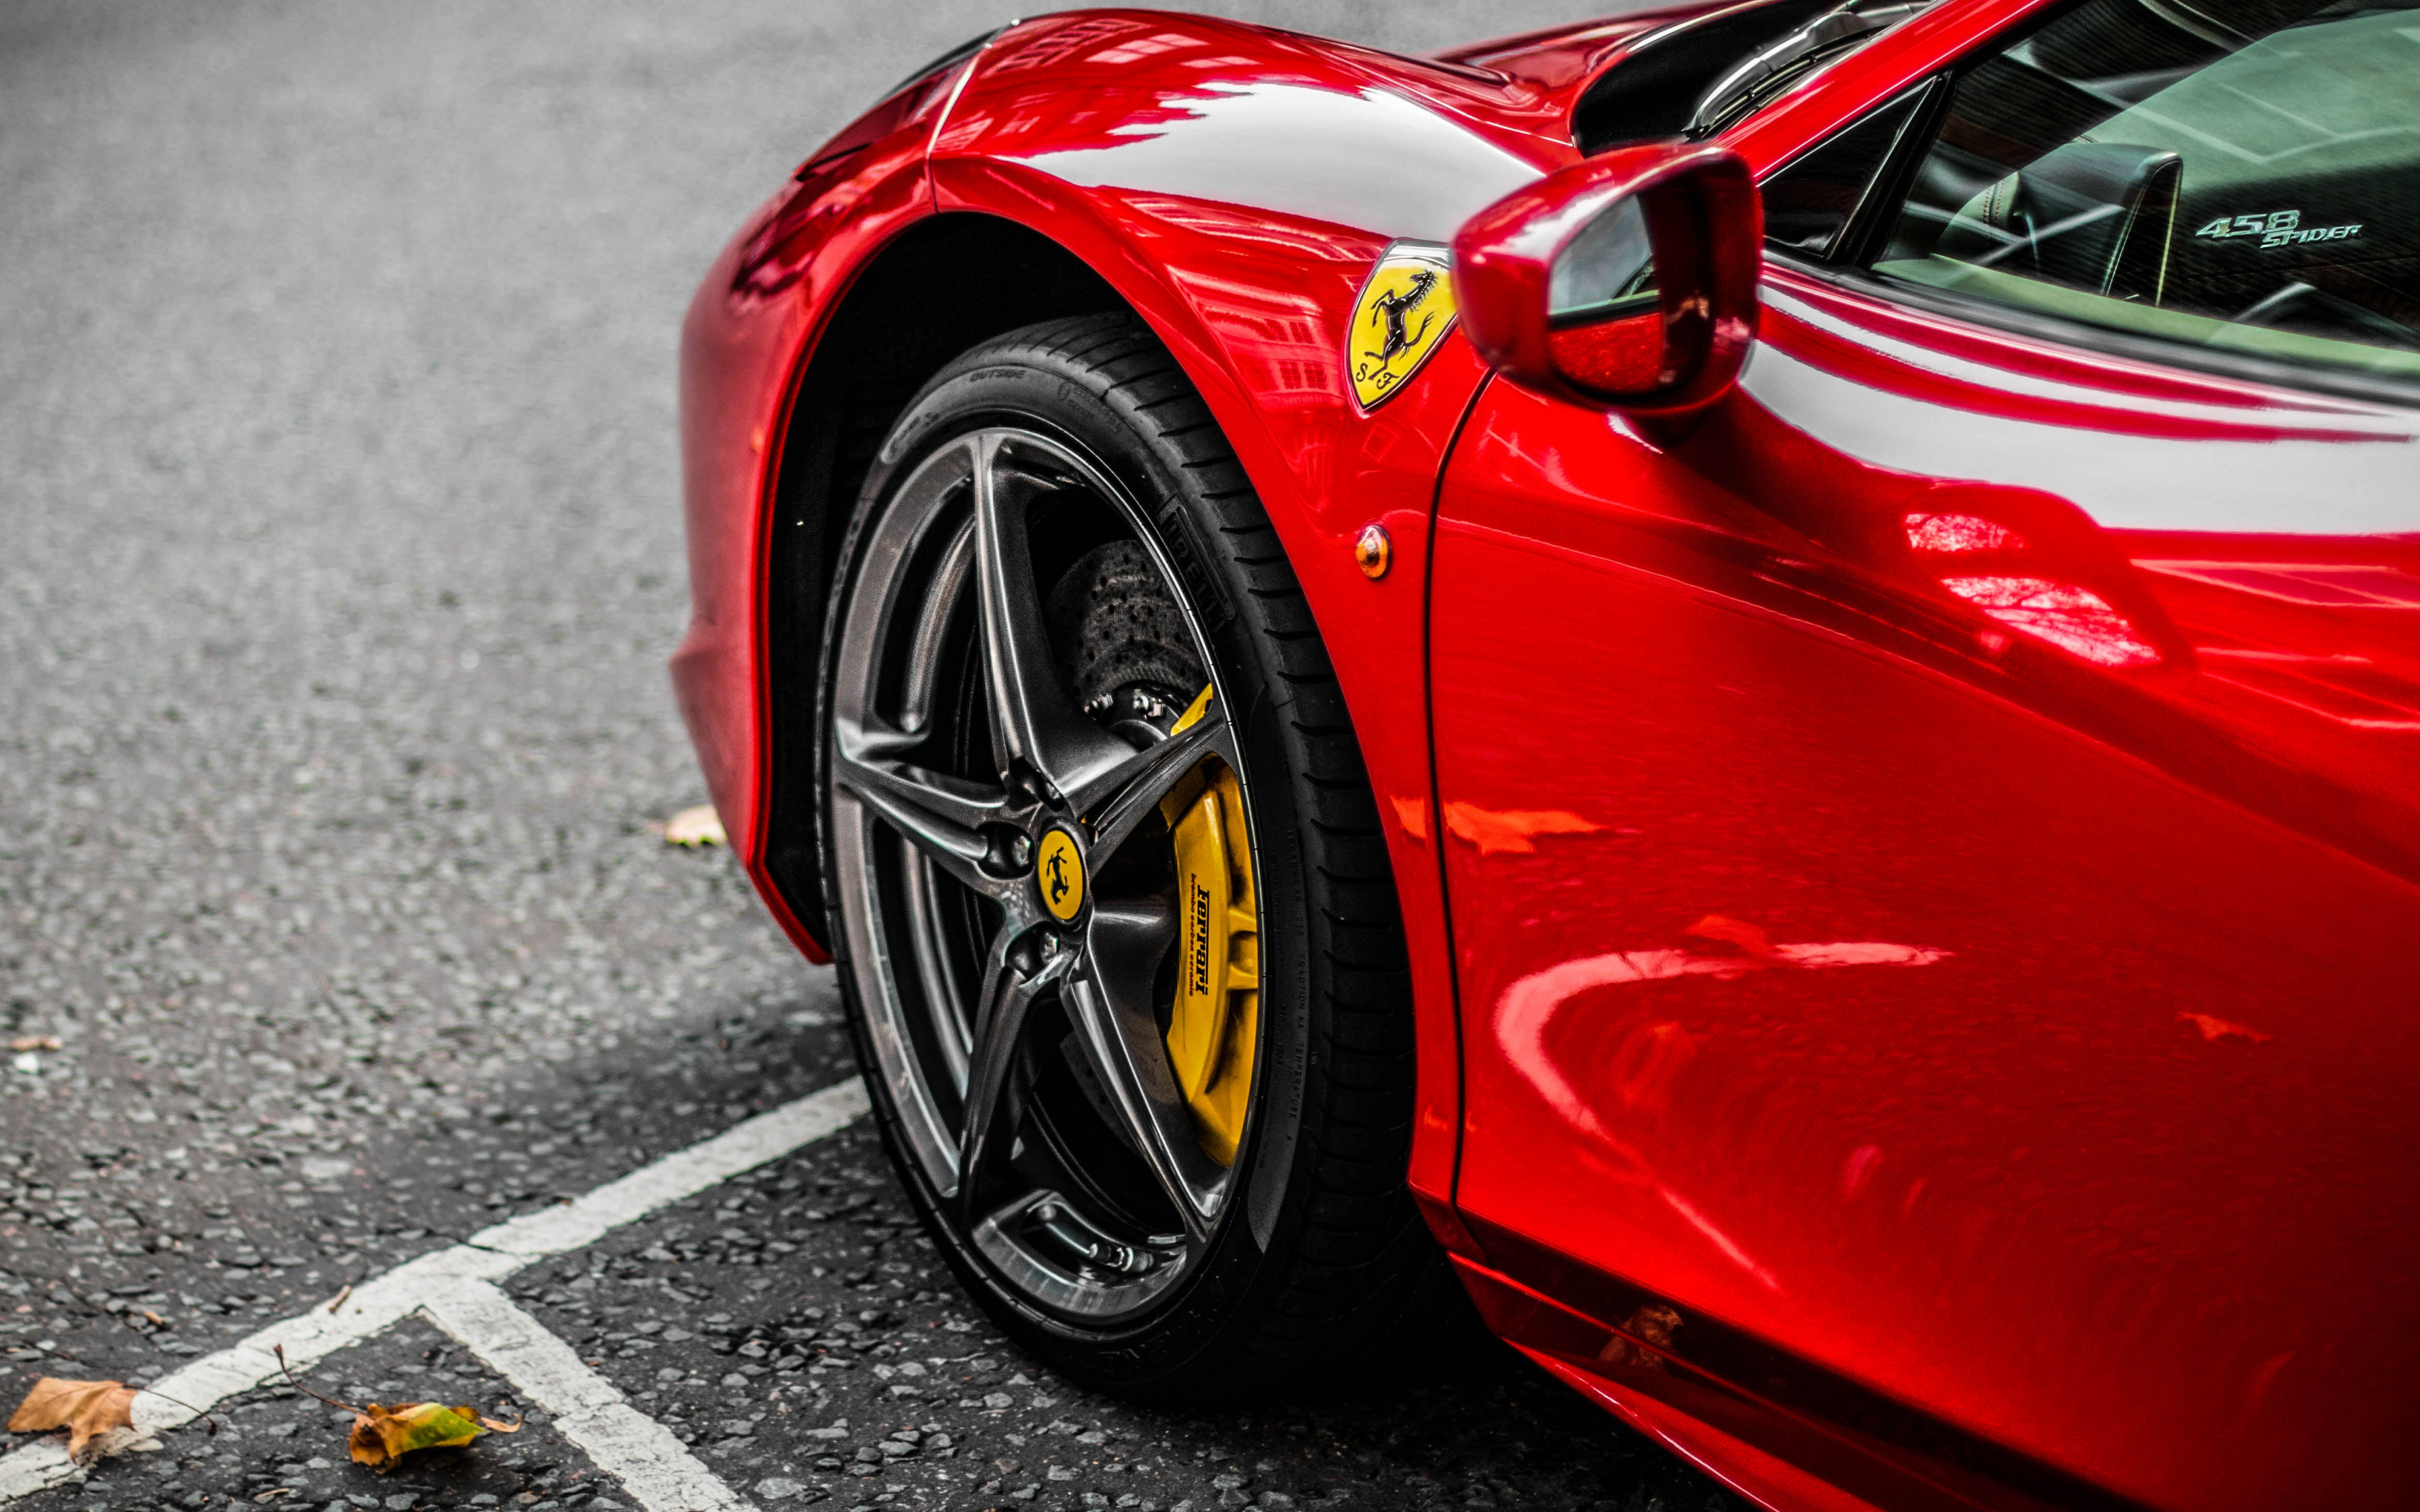 download 3840x2400 wallpaper red supercar ferrari wheel